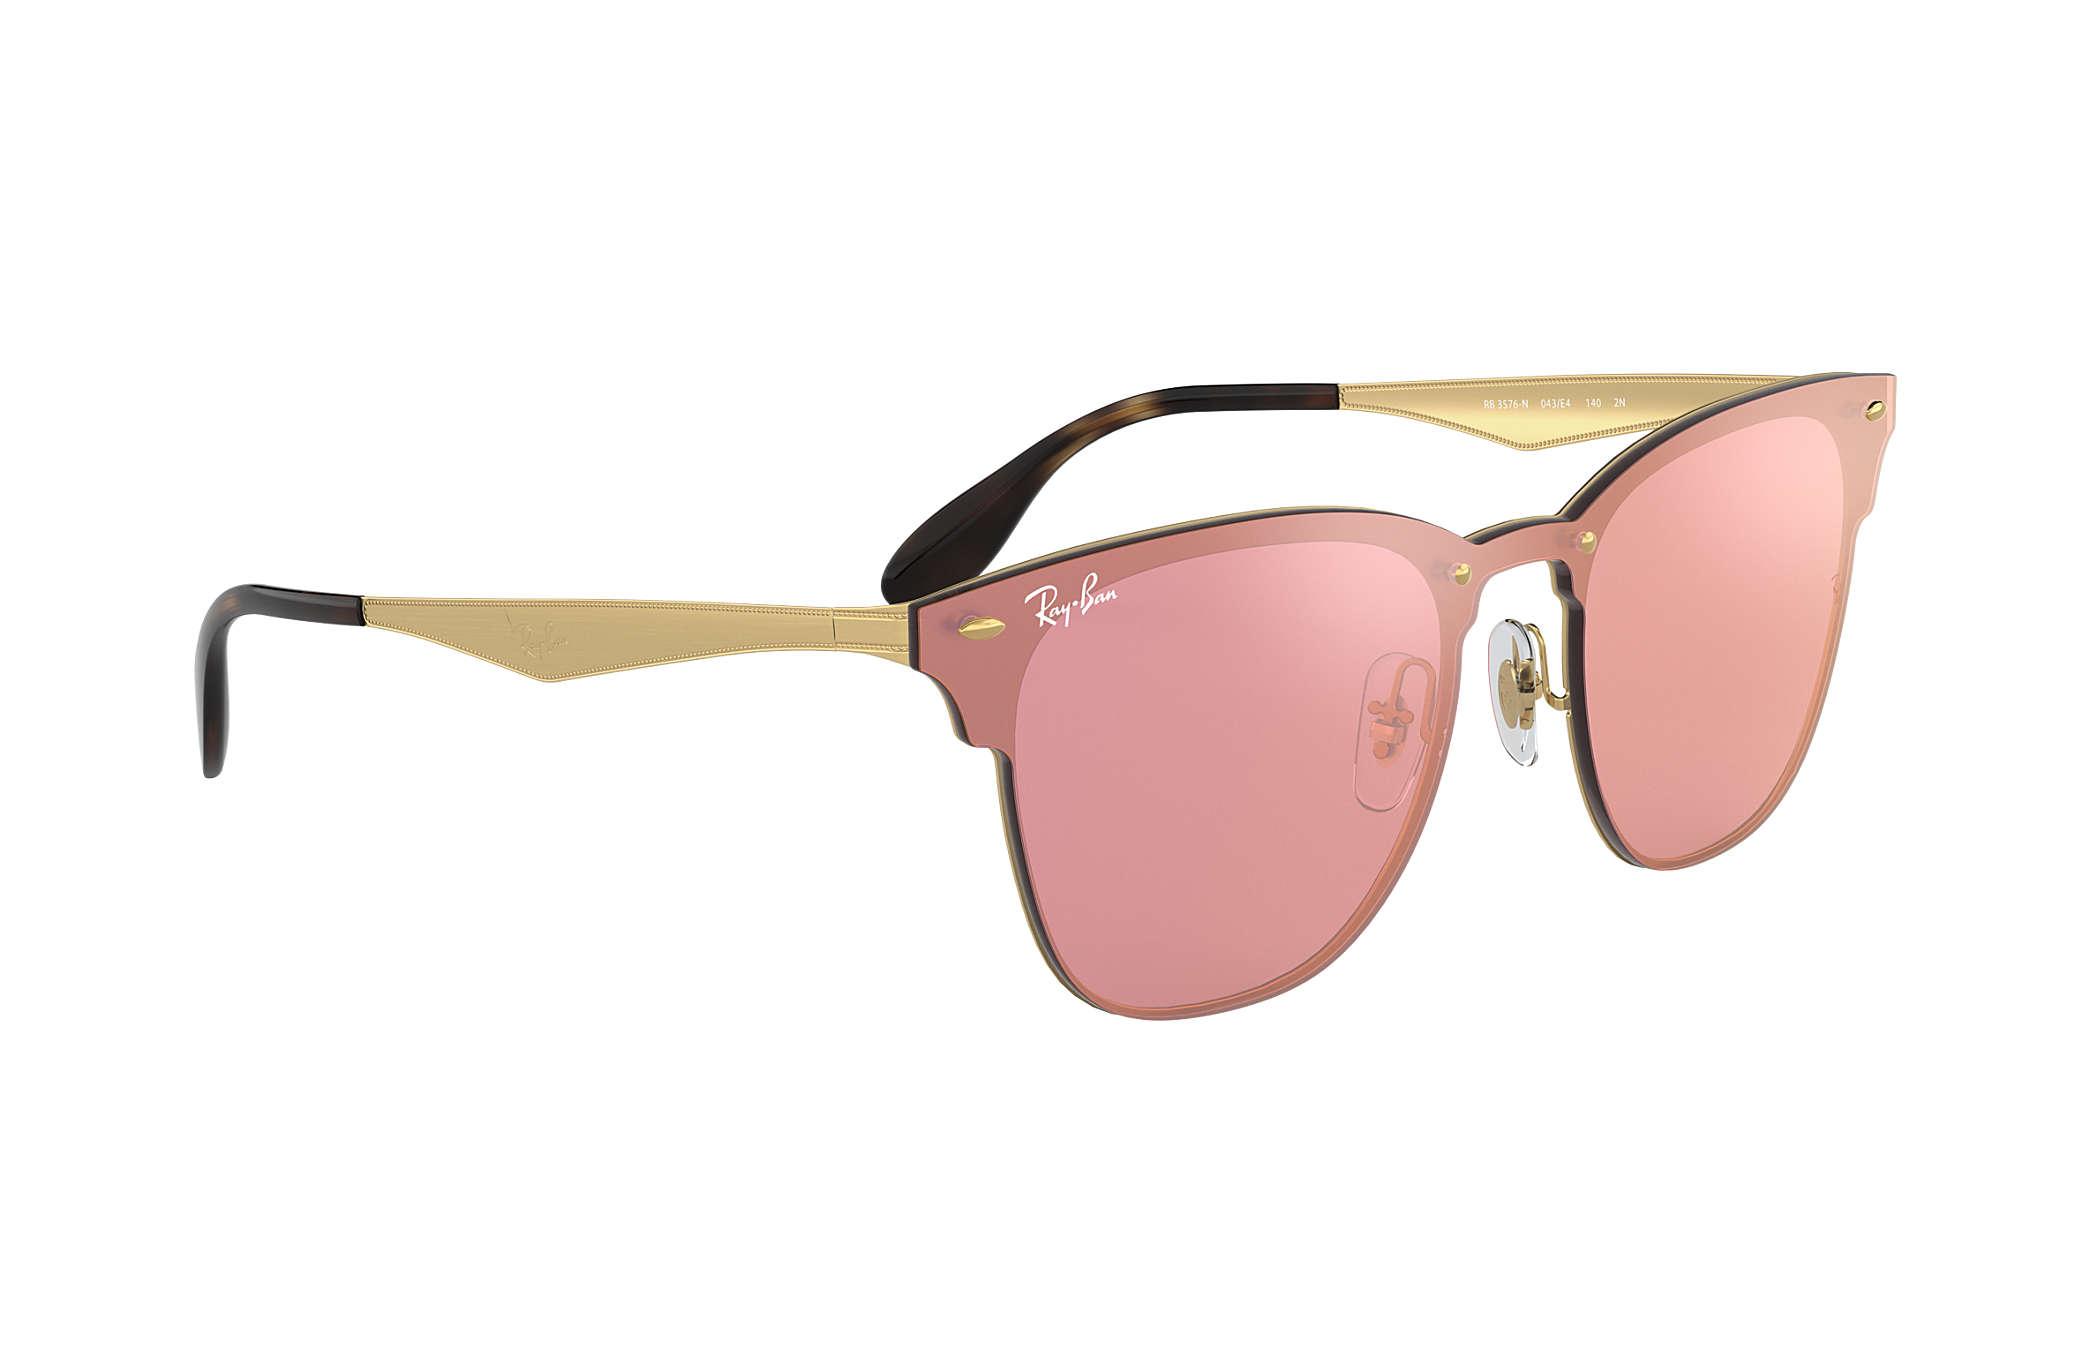 d51a7b4b5ea Ray-Ban Blaze Clubmaster RB3576N Gold - Metal - Pink Lenses ...